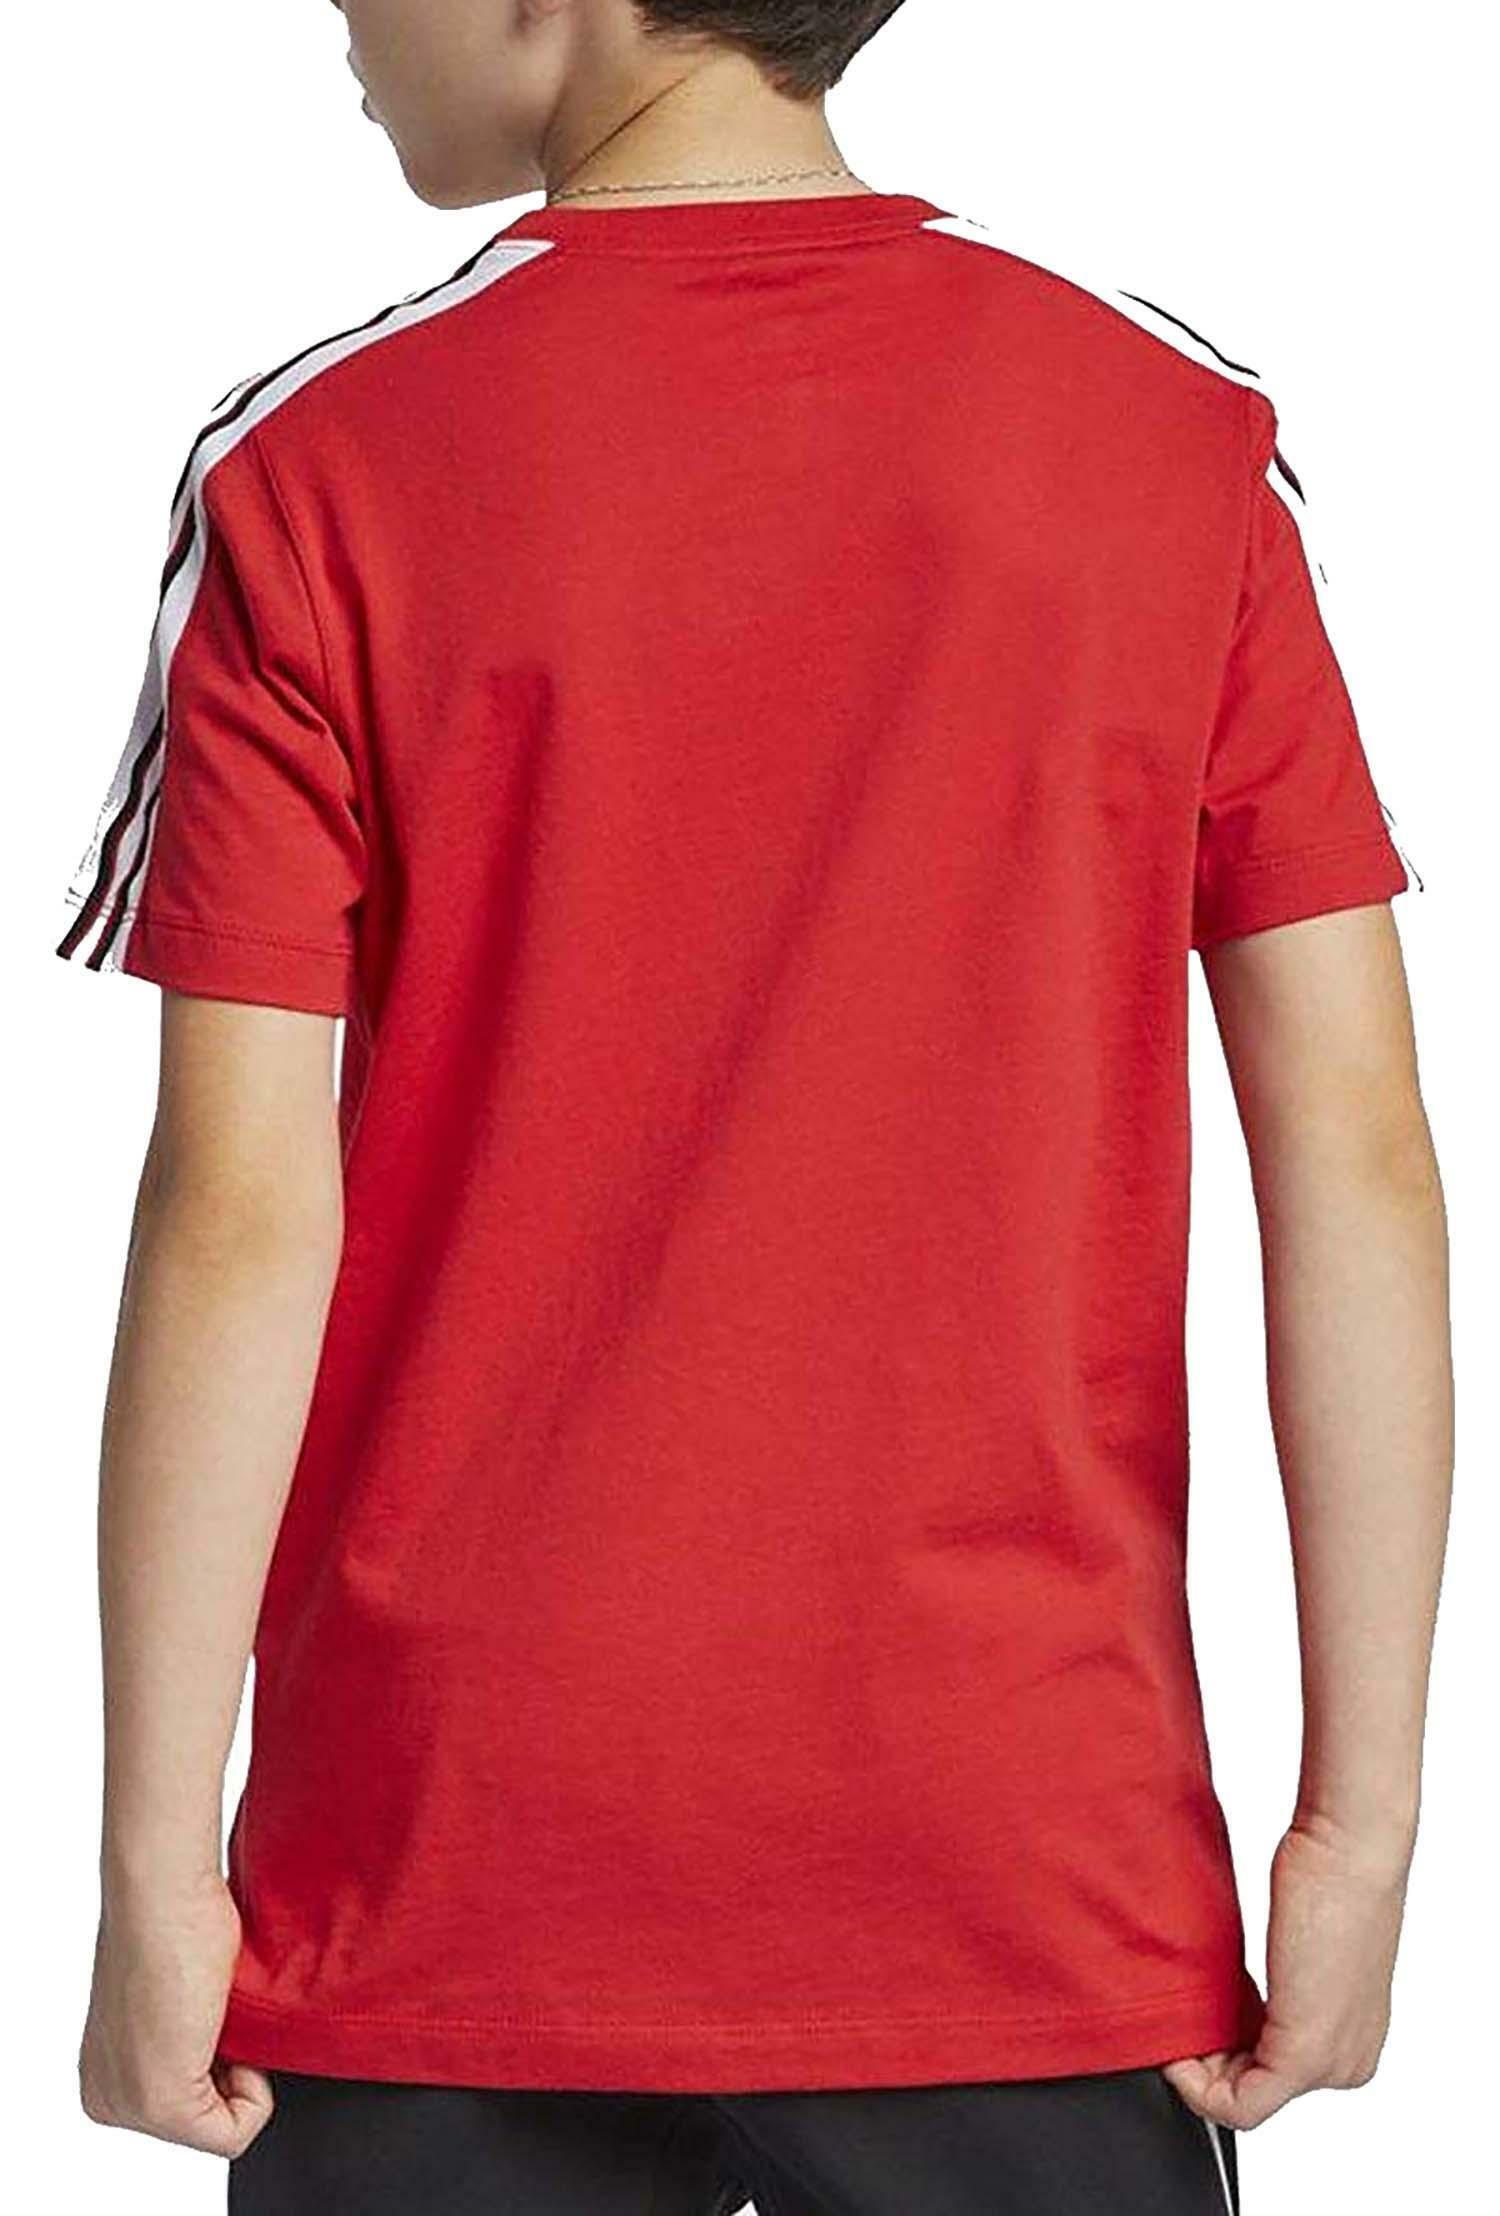 nike t-shirt bambino rossa ar5280